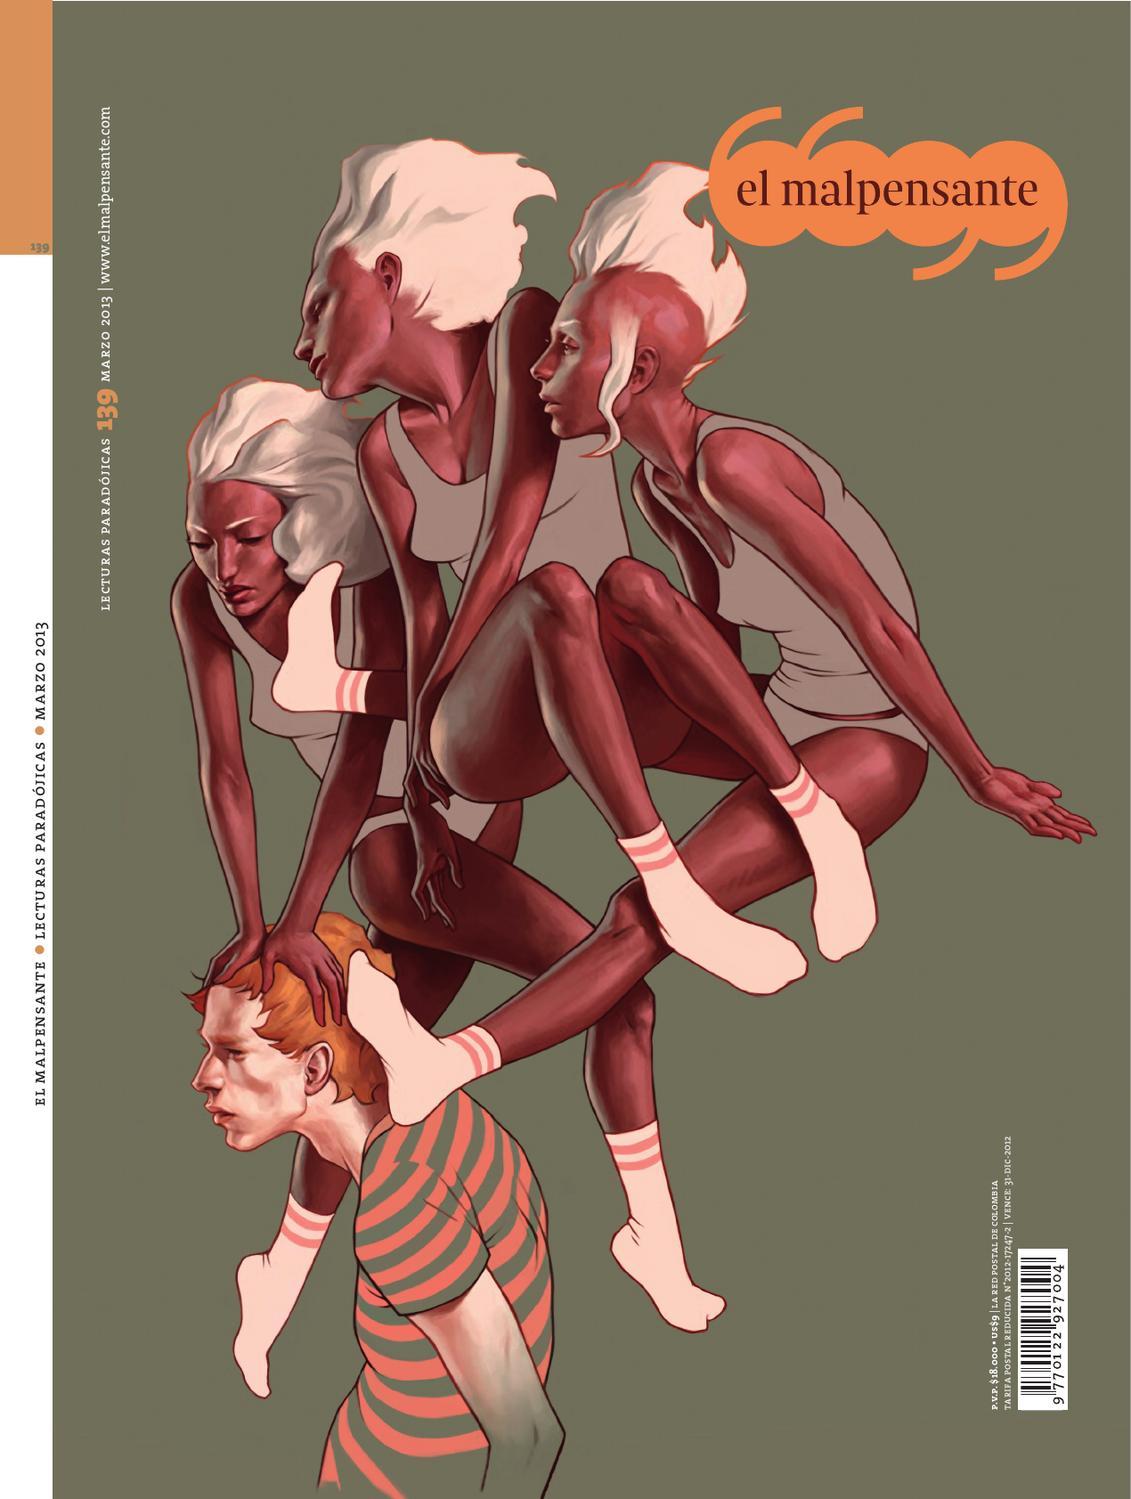 Abuela En Pompa Porn revista e malpensante139el malpensante revista - issuu